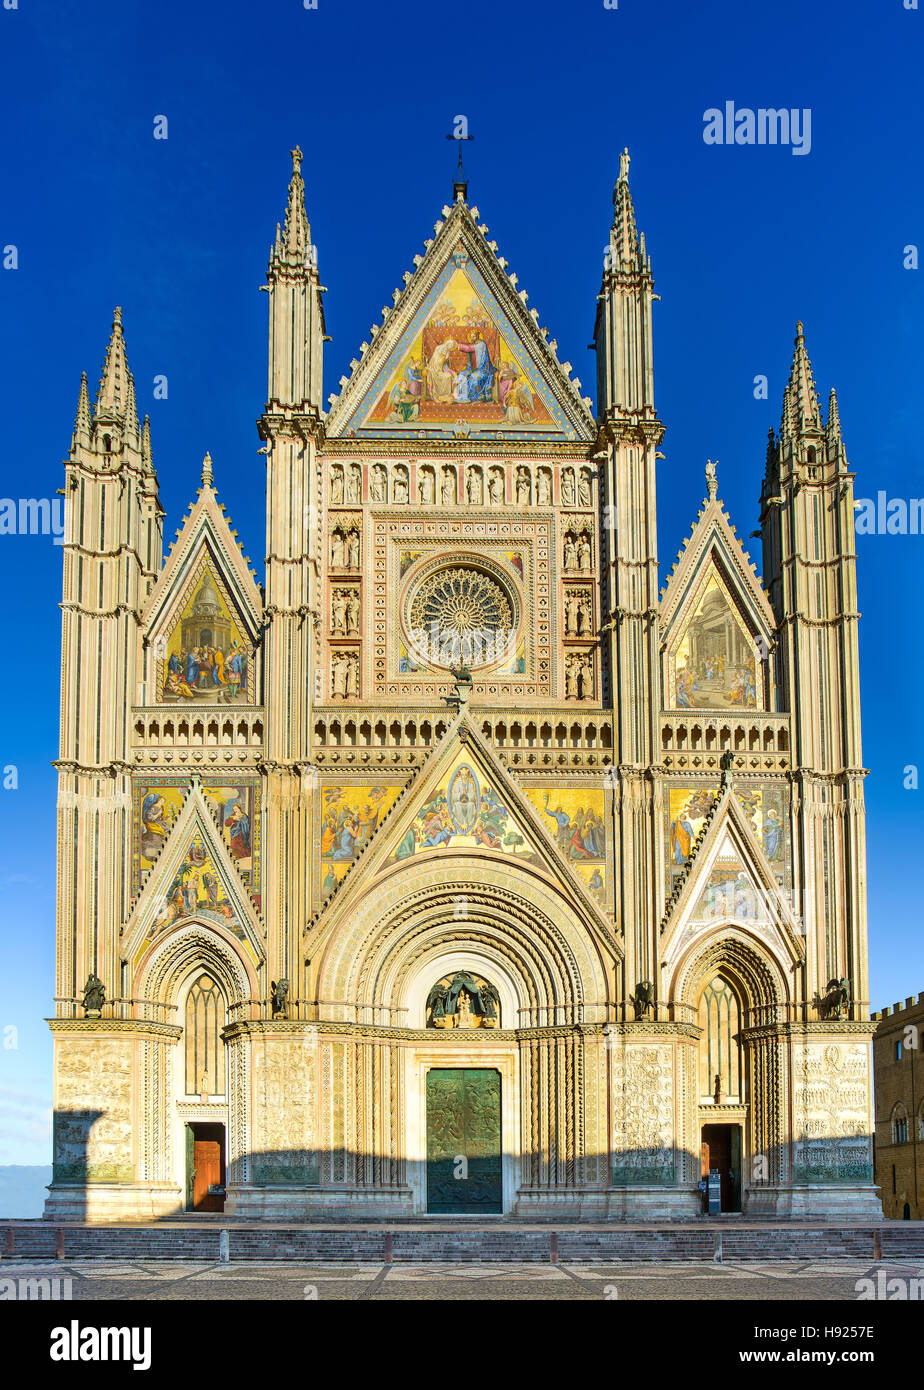 Orvieto medieval Duomo cathedral church landmark facade front view. Umbria, Italy, Europe. - Stock Image